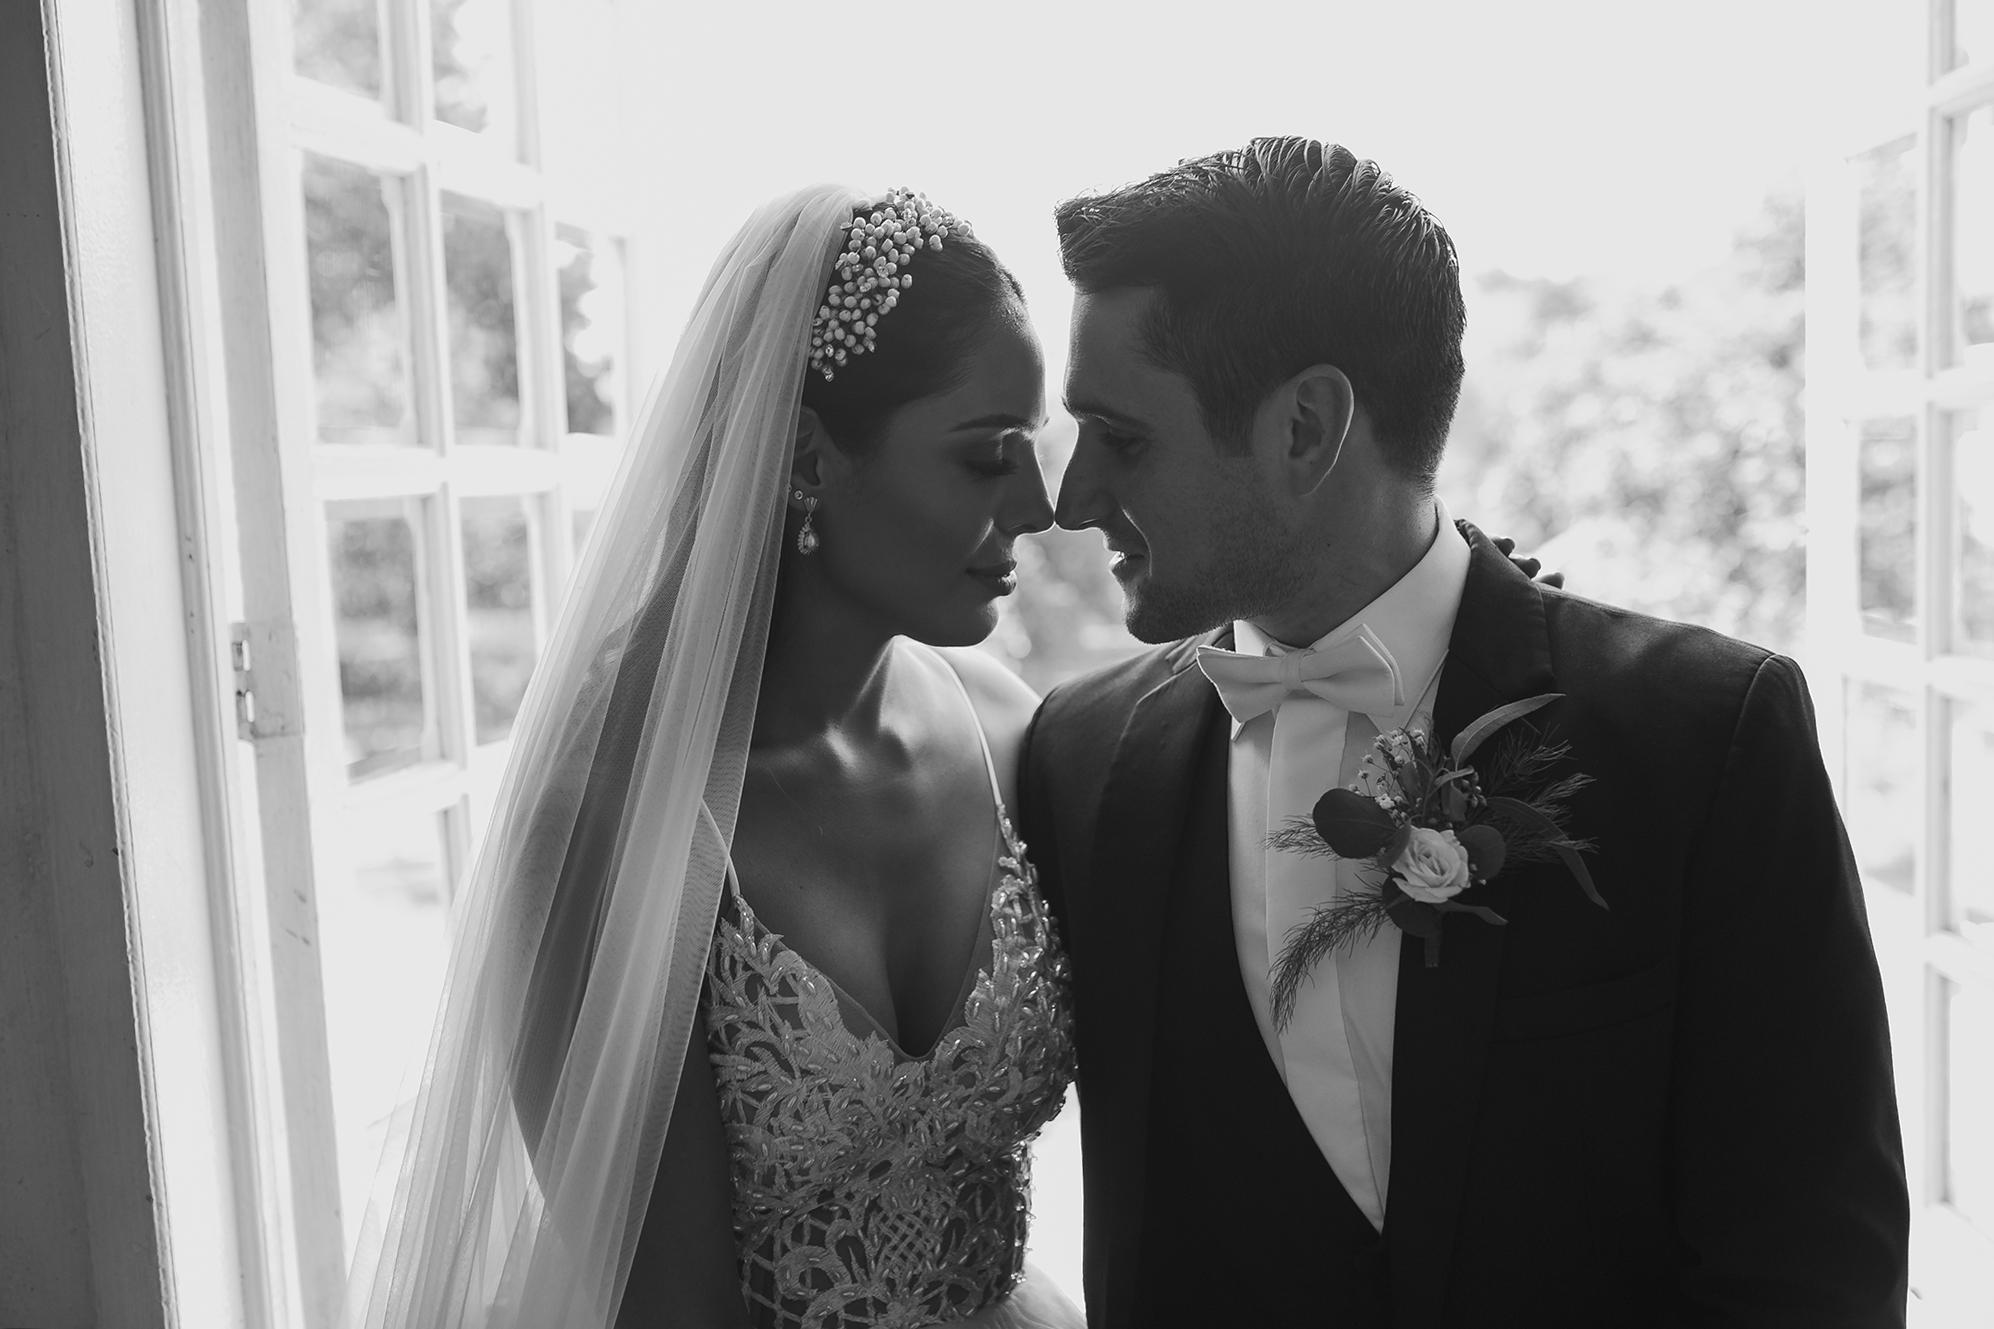 0388R&F__WeddingDestination_Weddingmerida_BodaMexico_FotografoDeBodas_FabrizioSimoneenFotografo.jpg